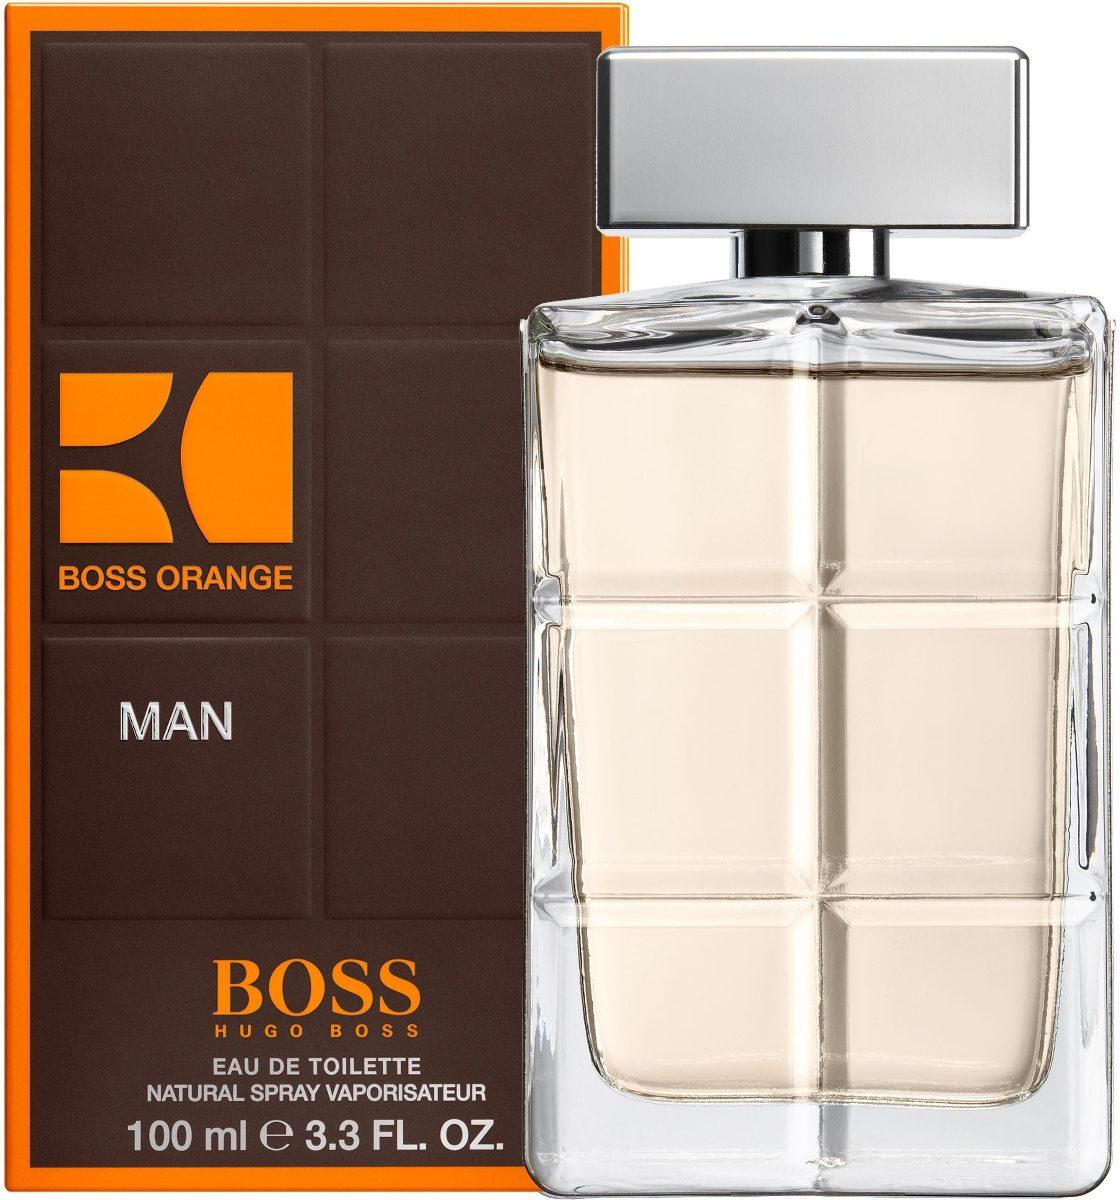 hugo boss boss orange eau de toilette. Black Bedroom Furniture Sets. Home Design Ideas